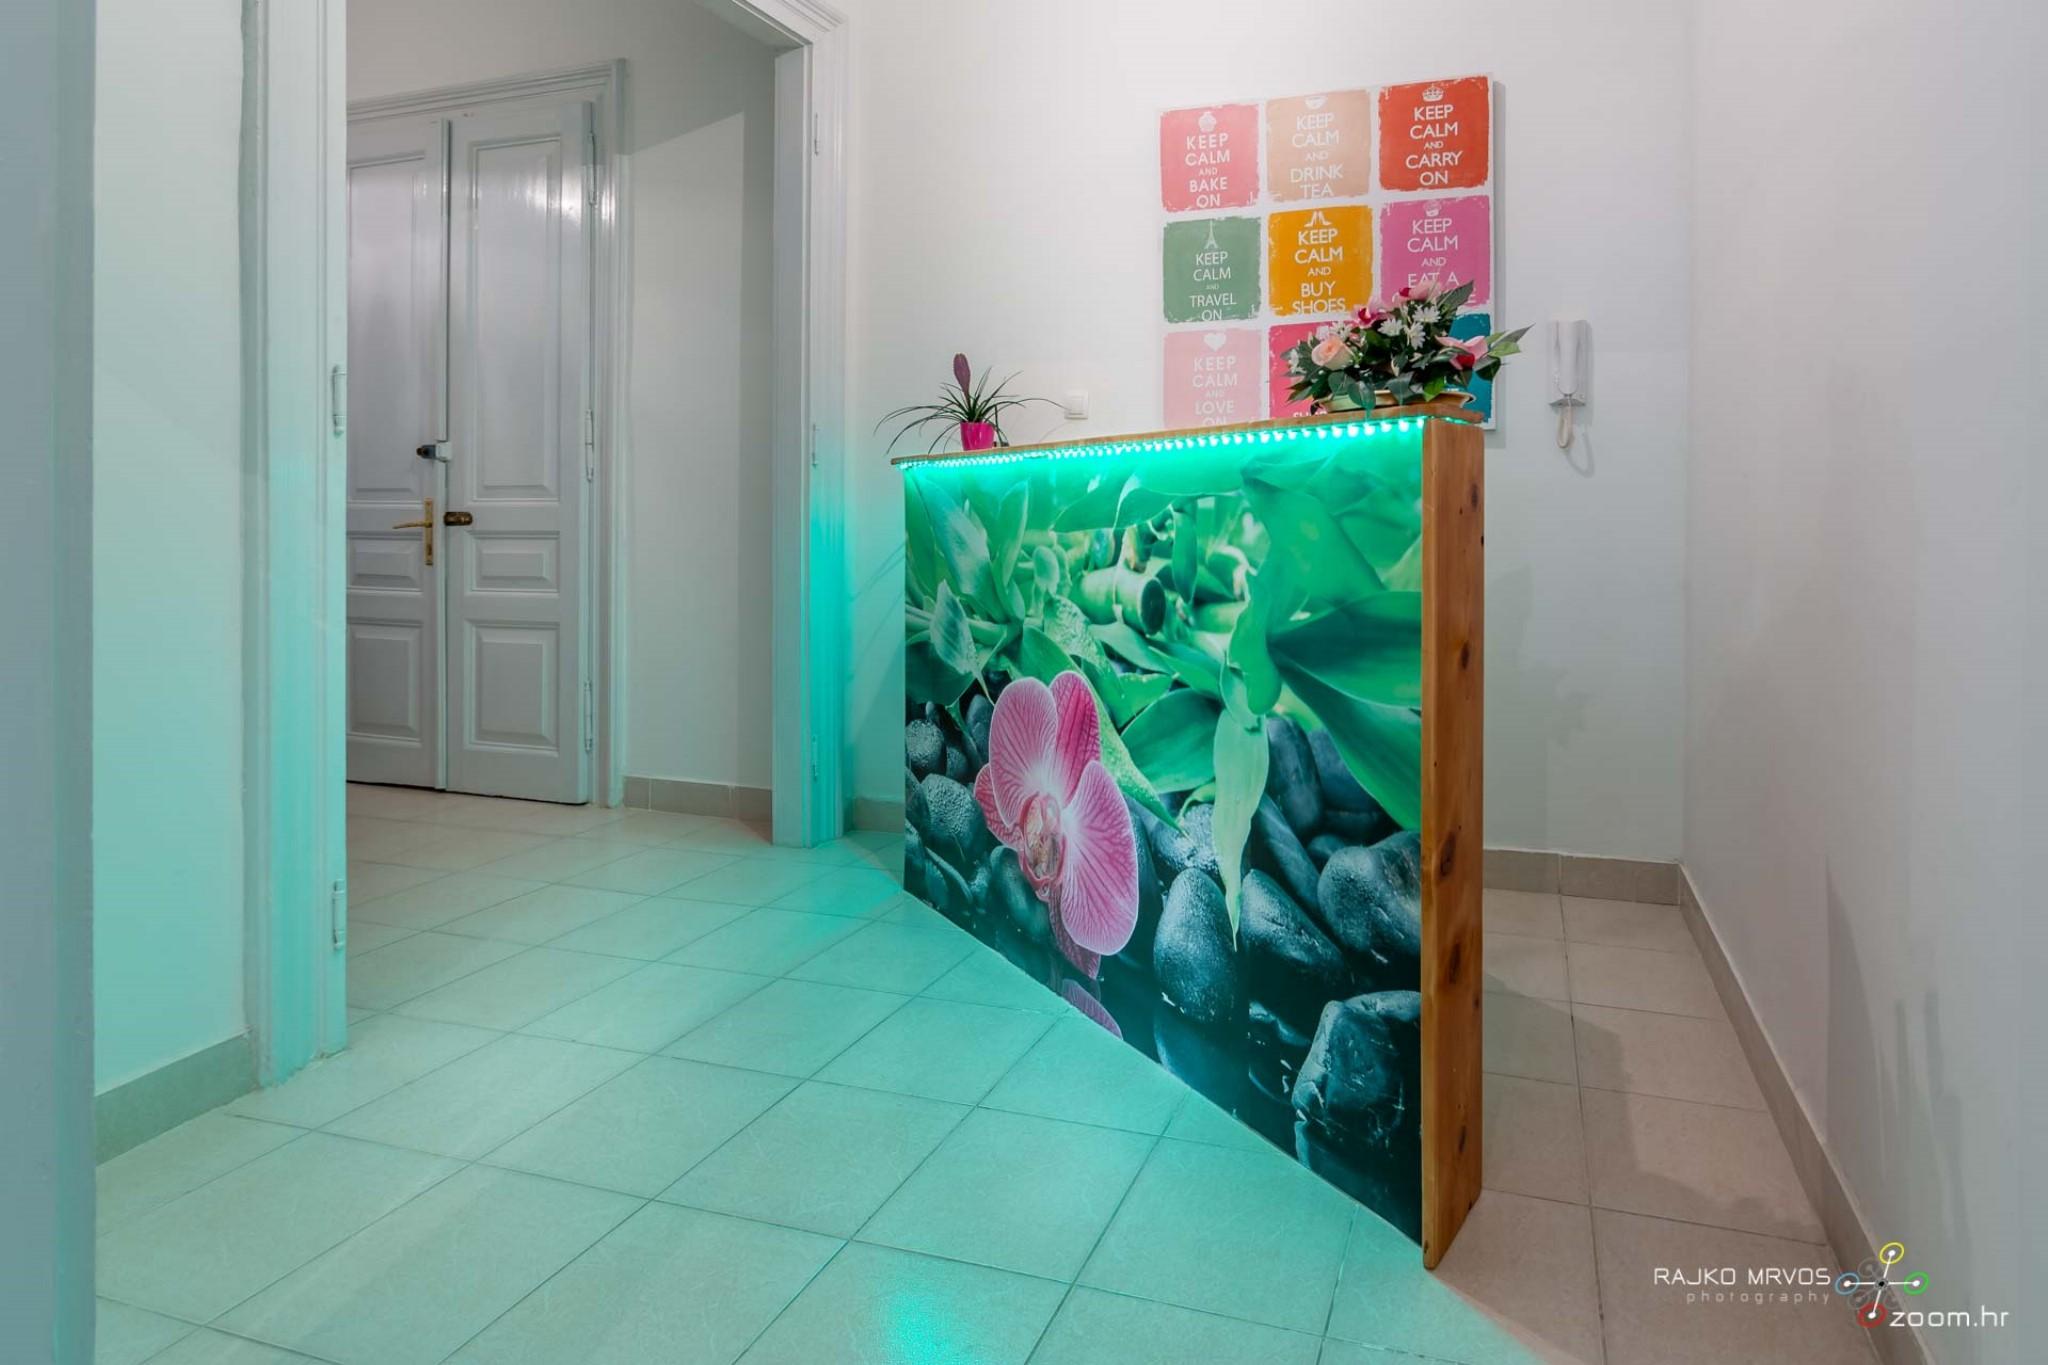 fotografiranje-interijera-fotograf-eksterijera-apartmana-vila-kuca-hostela-Happy-Hostel-14